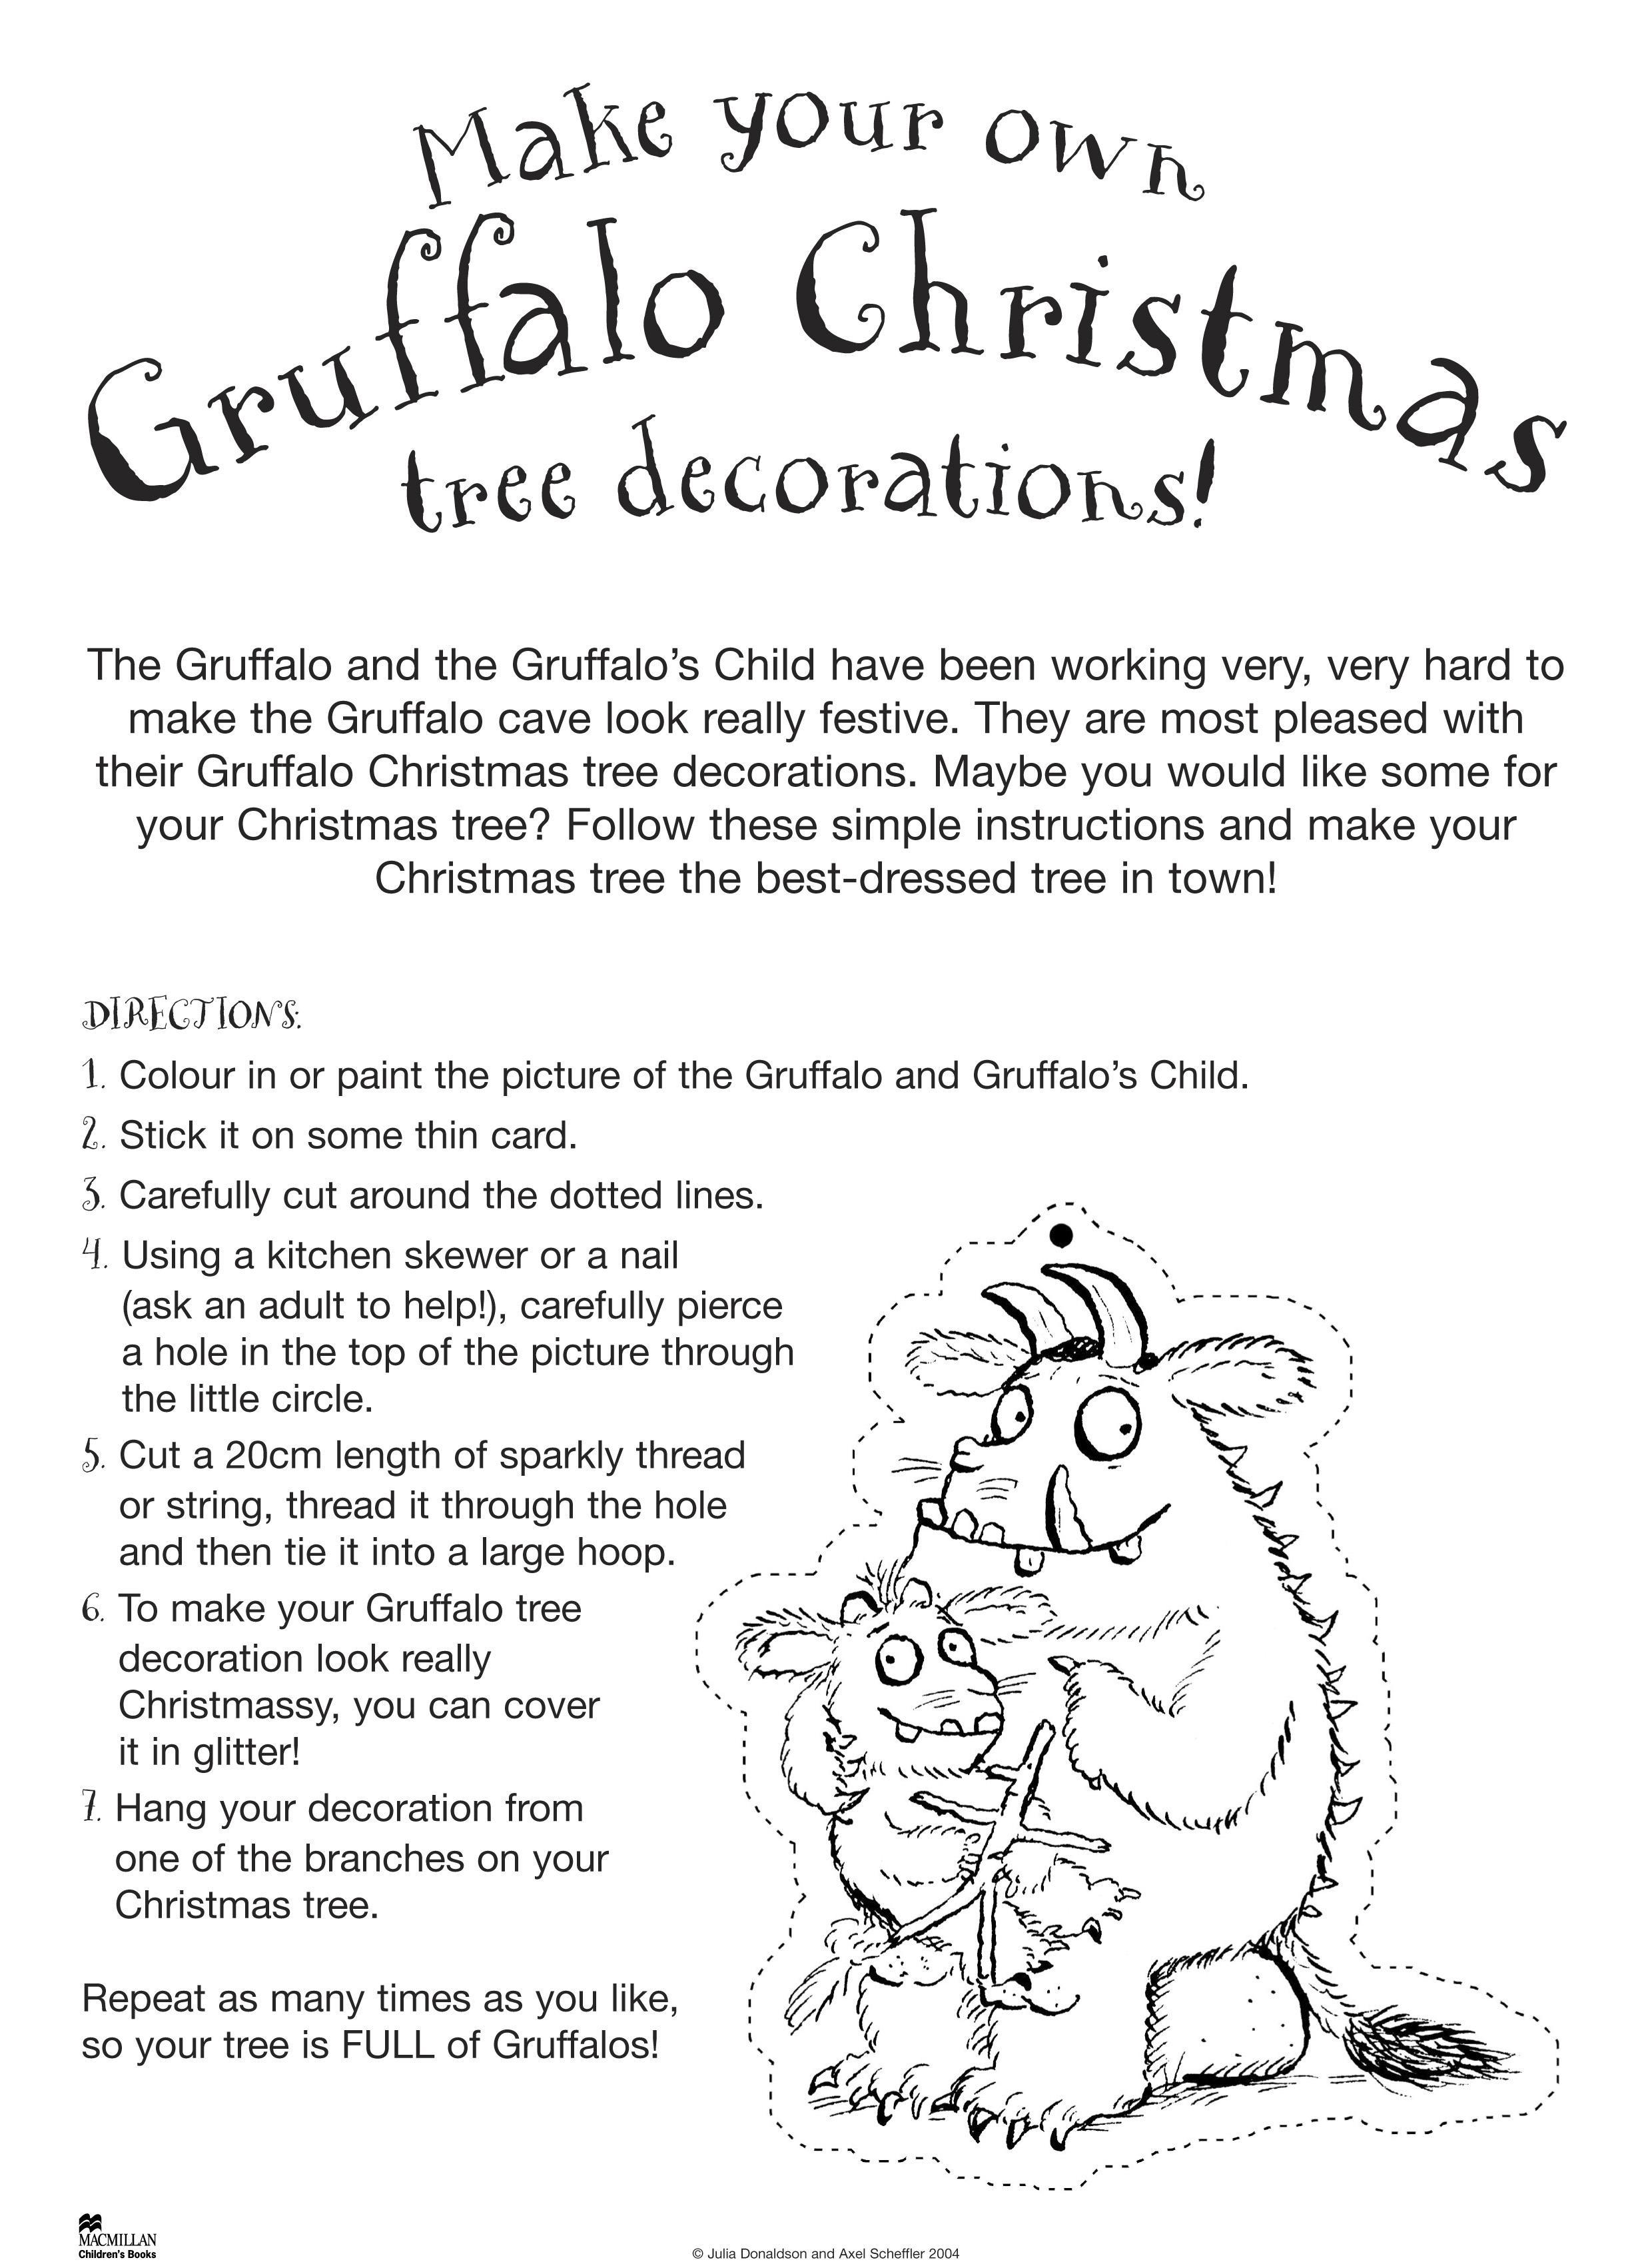 Make Gruffalo Christmas Decorations